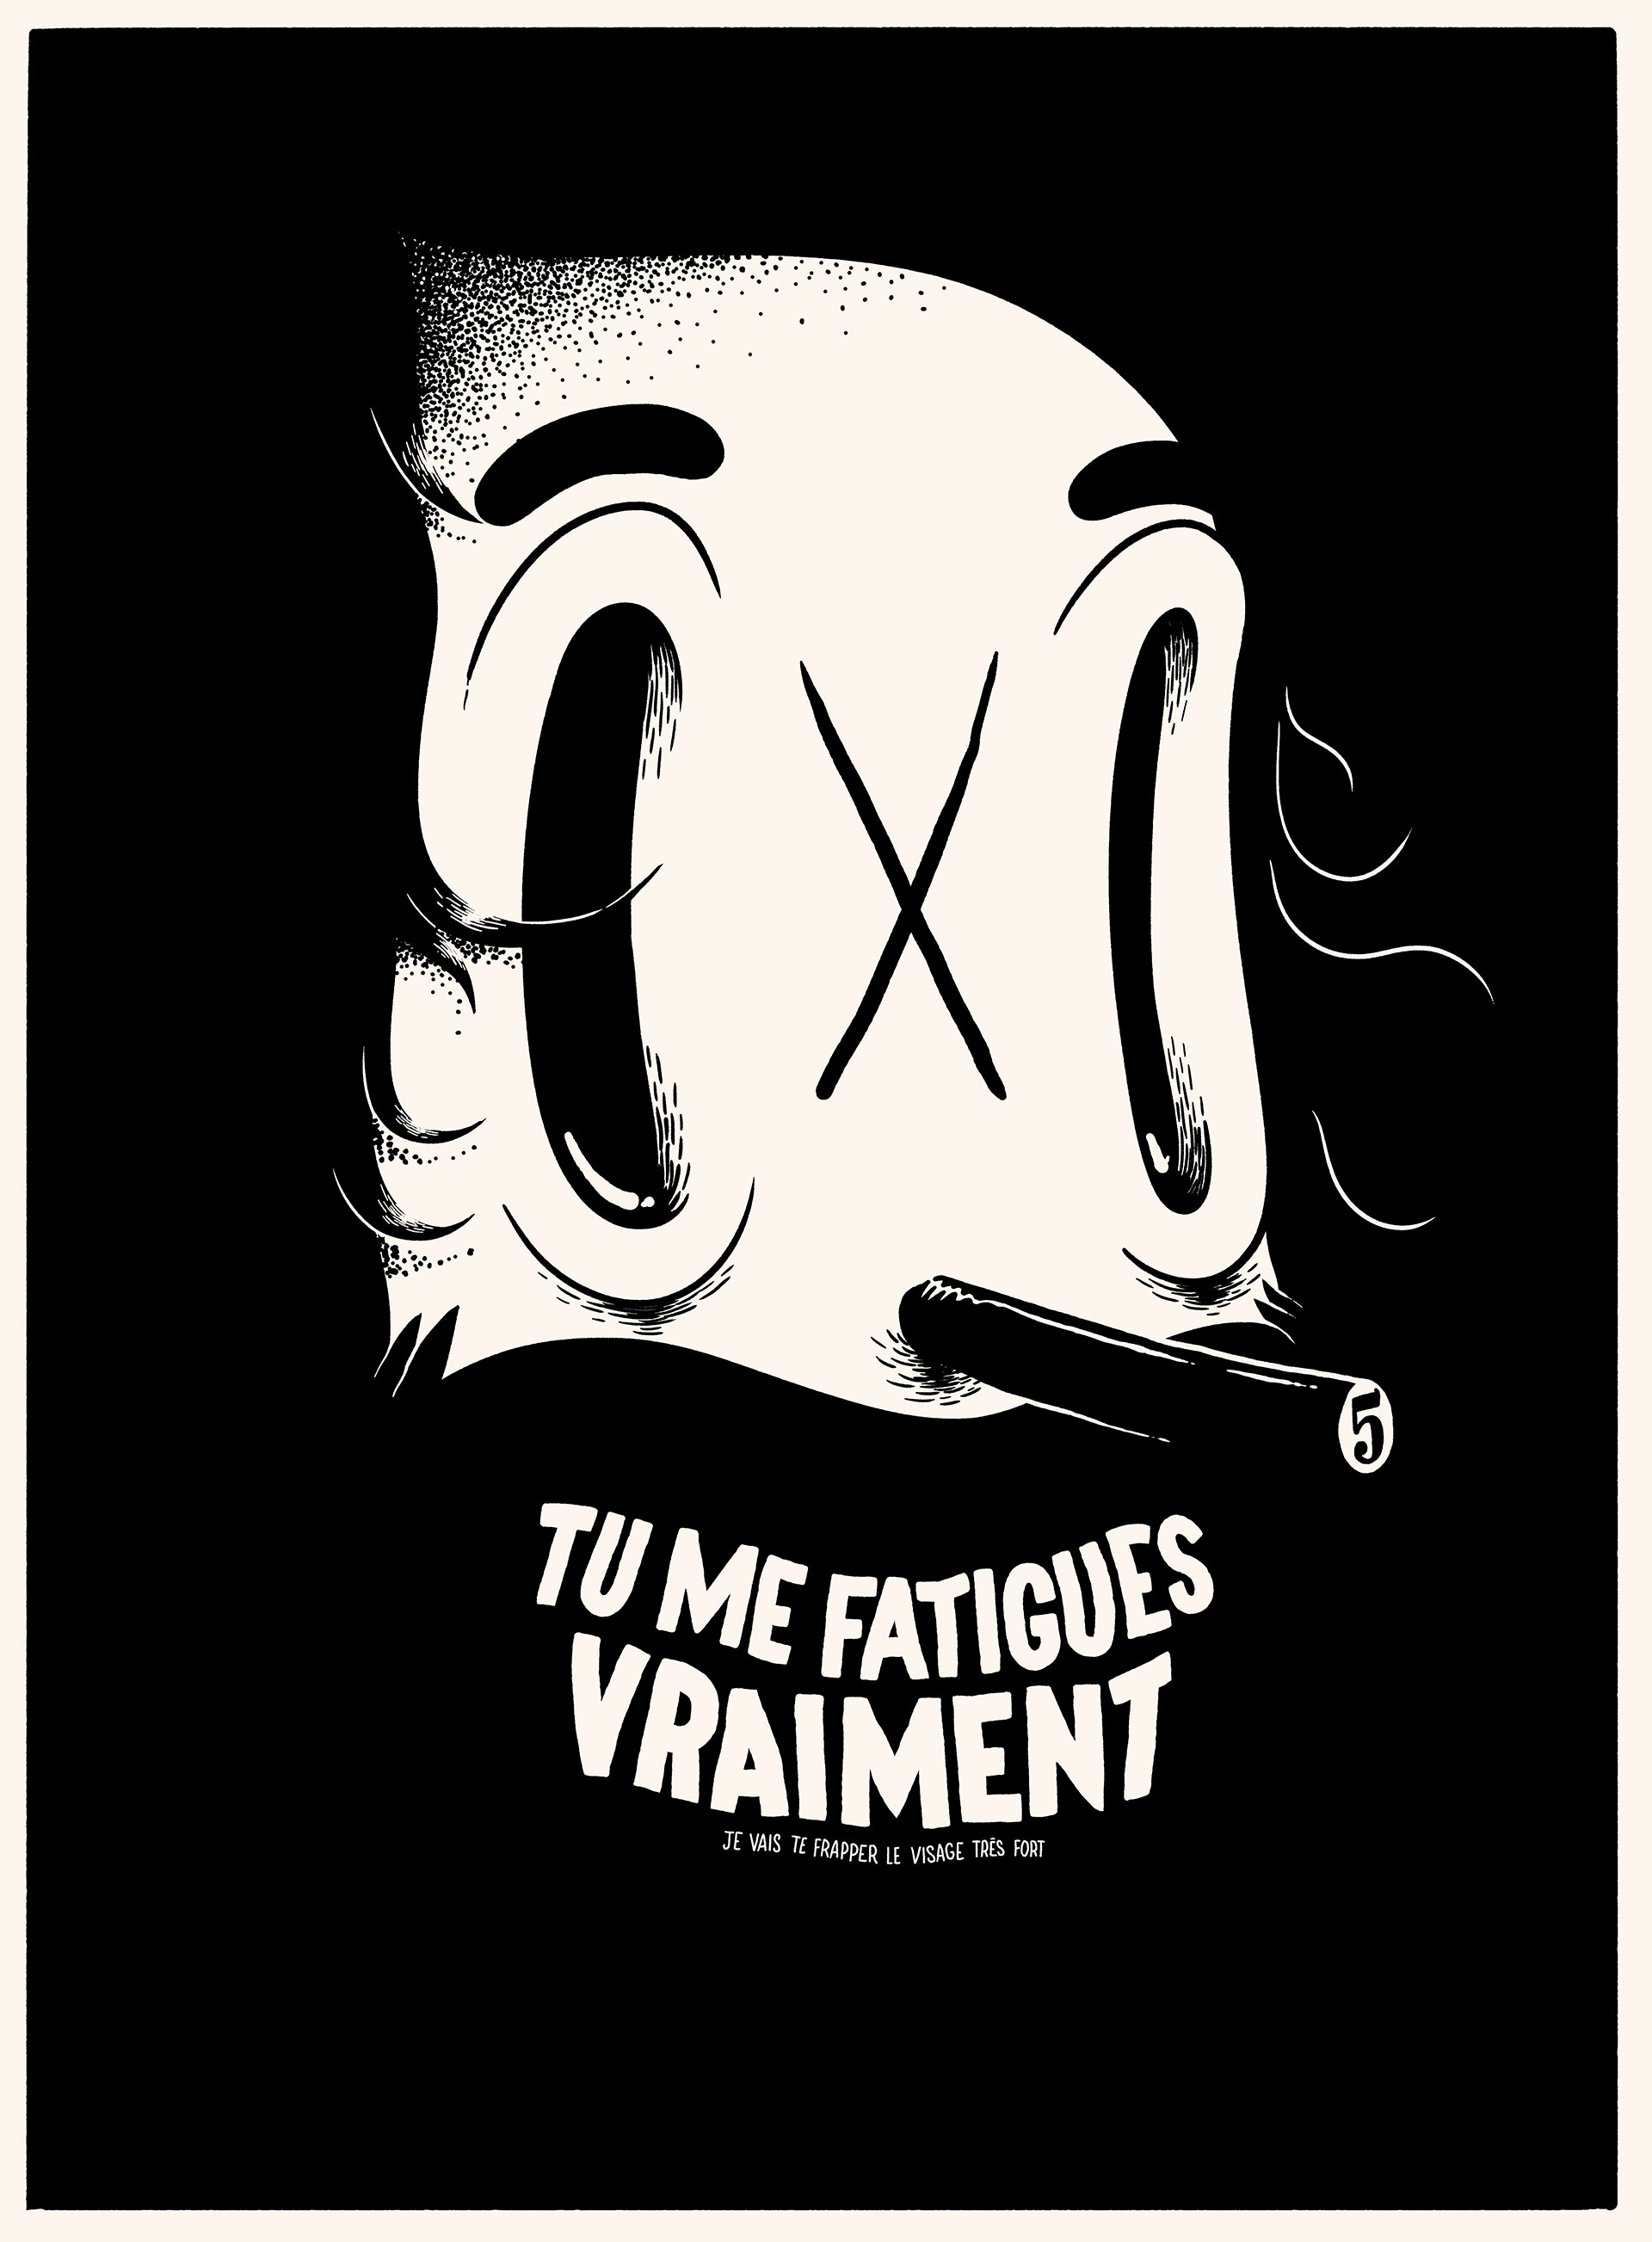 tumefatigue.jpg